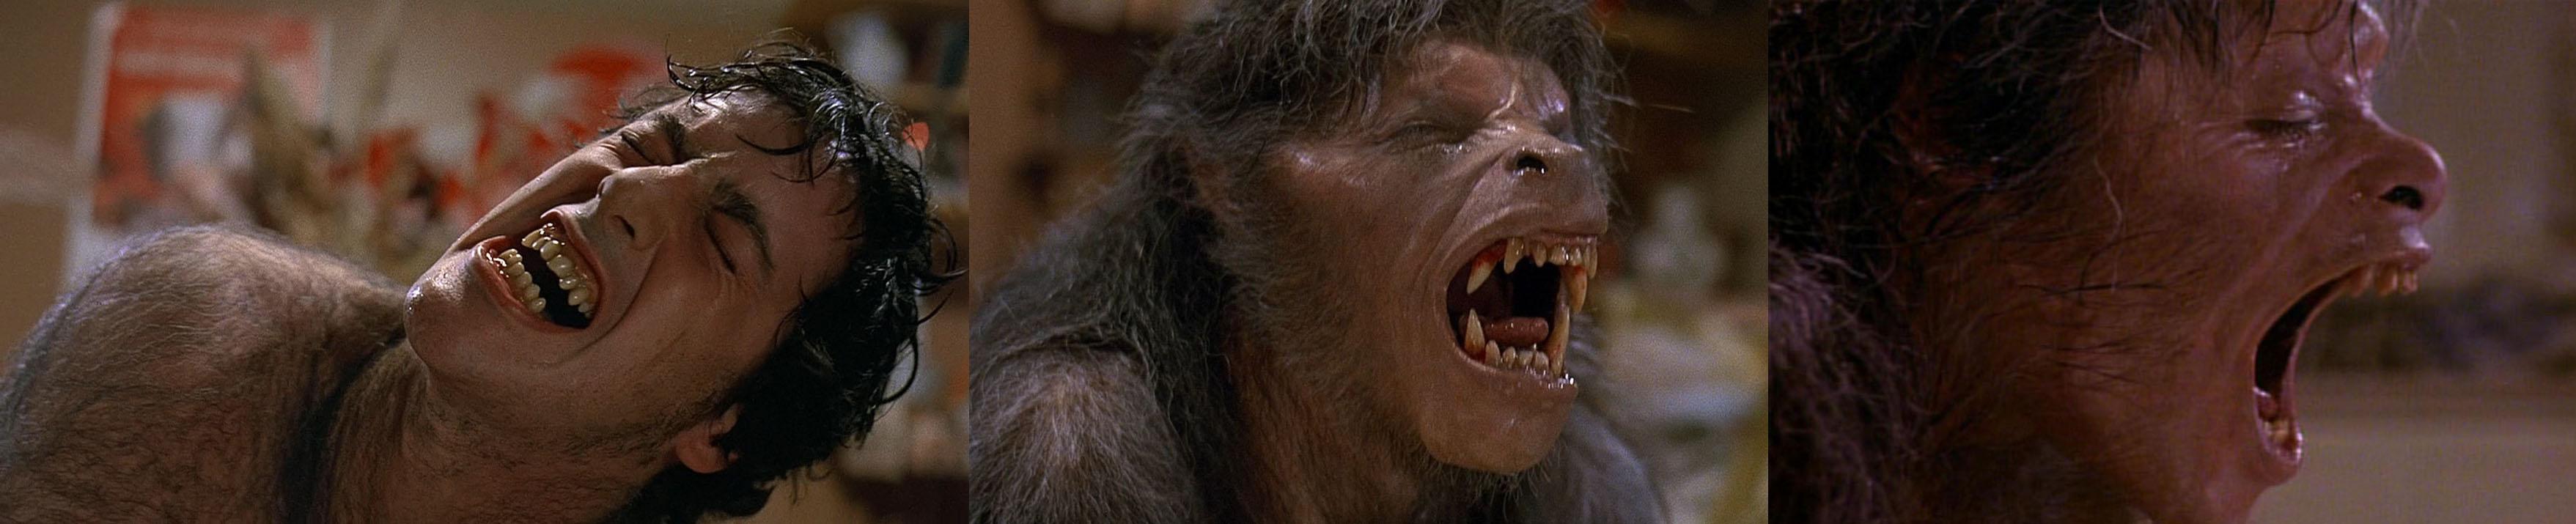 an-american-werewolf-in-london-banner-poster